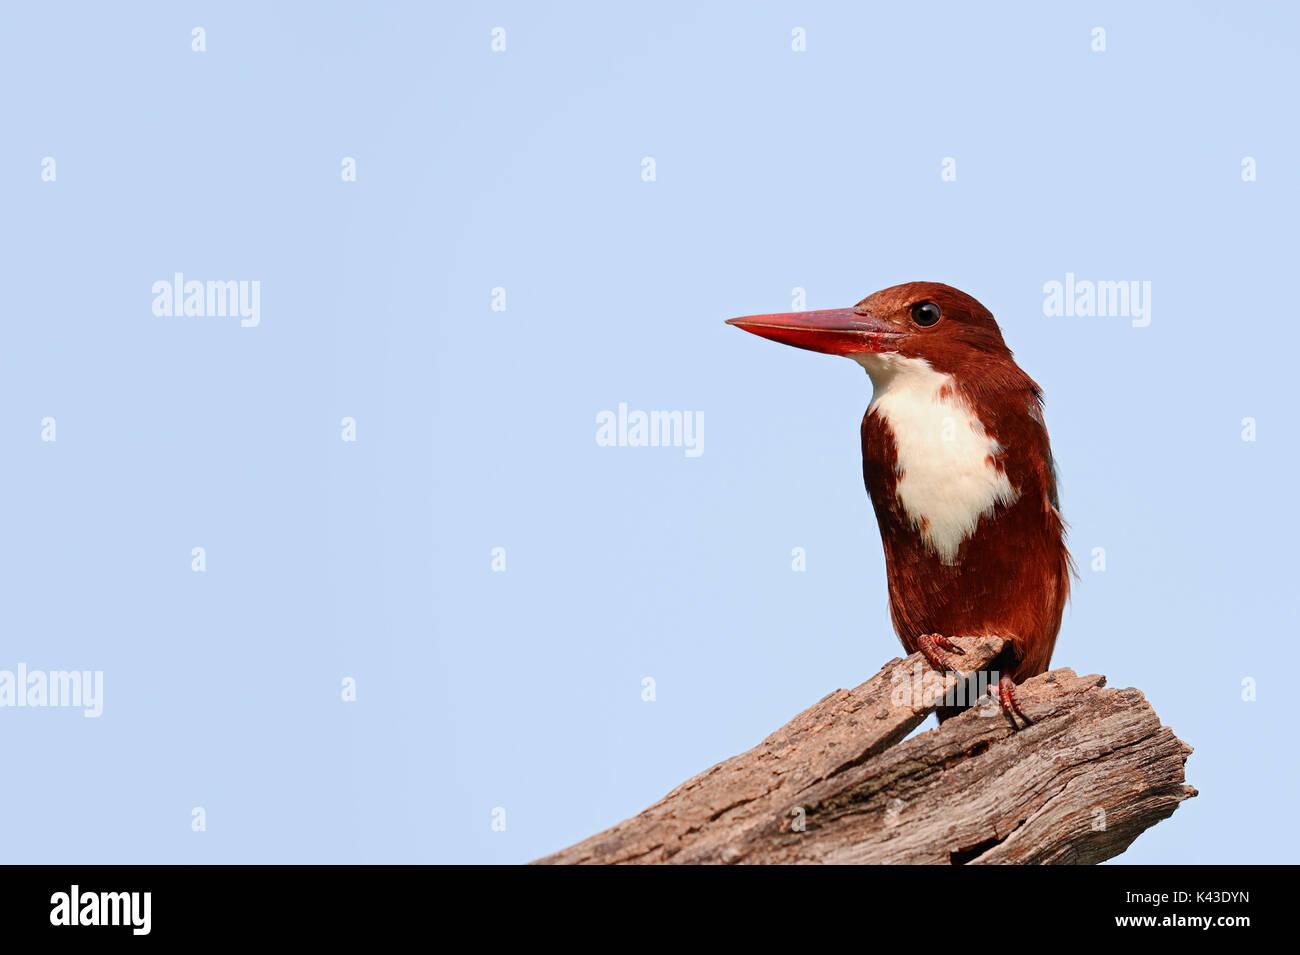 White-throated Kingfisher, Keoladeo Ghana national park, Rajasthan, India / (Halcyon smyrnensis) | Braunliest, Keoladeo Ghana Nationalpark, Rajasthan - Stock Image